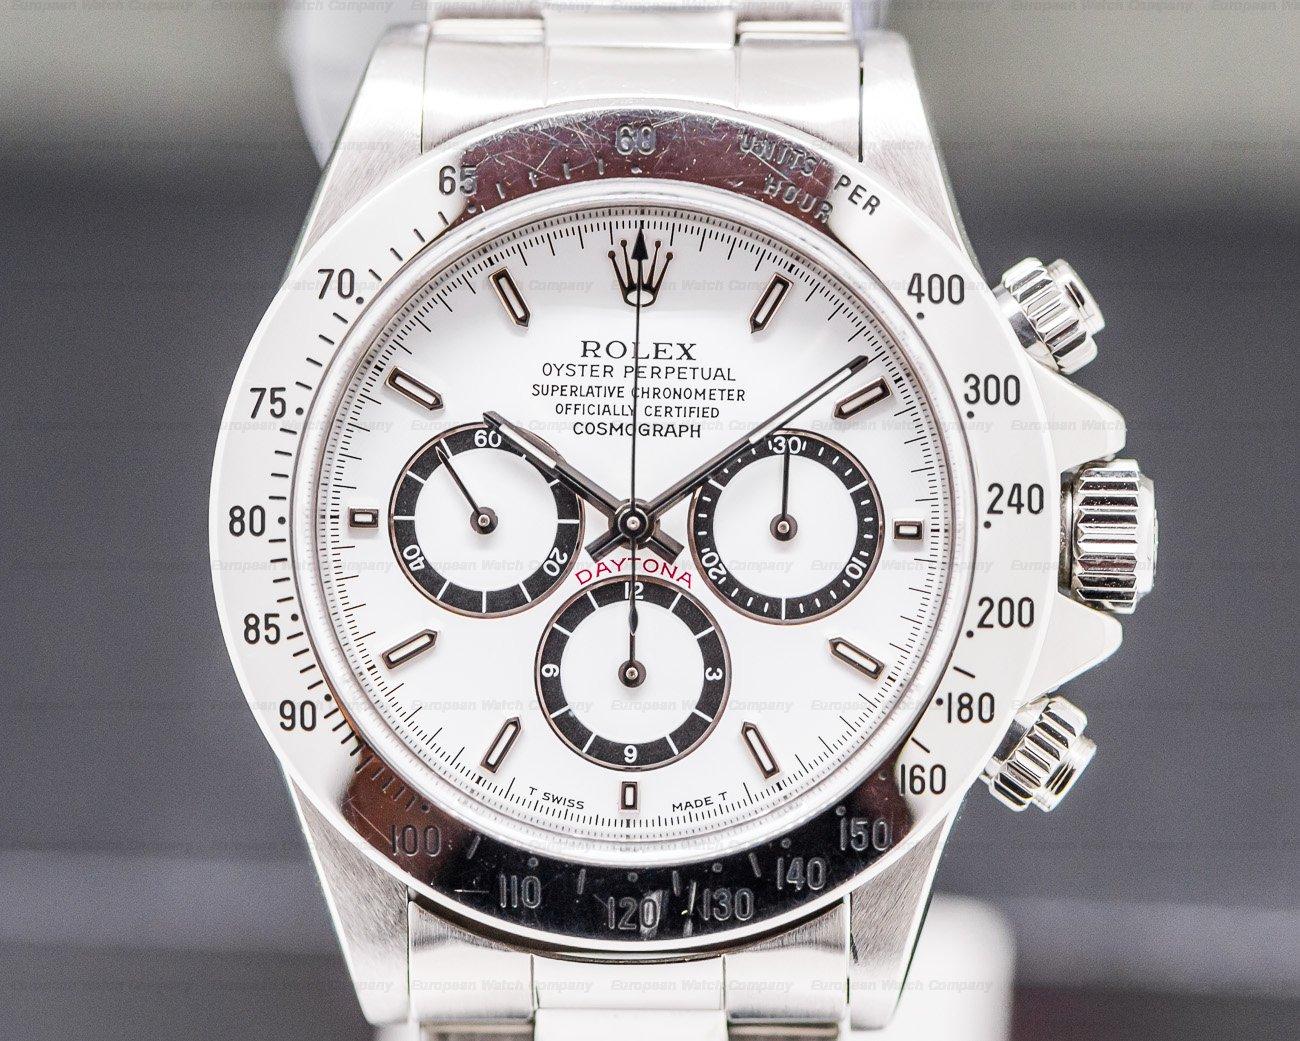 Rolex 16520 Daytona Zenith Movement White Dial SS